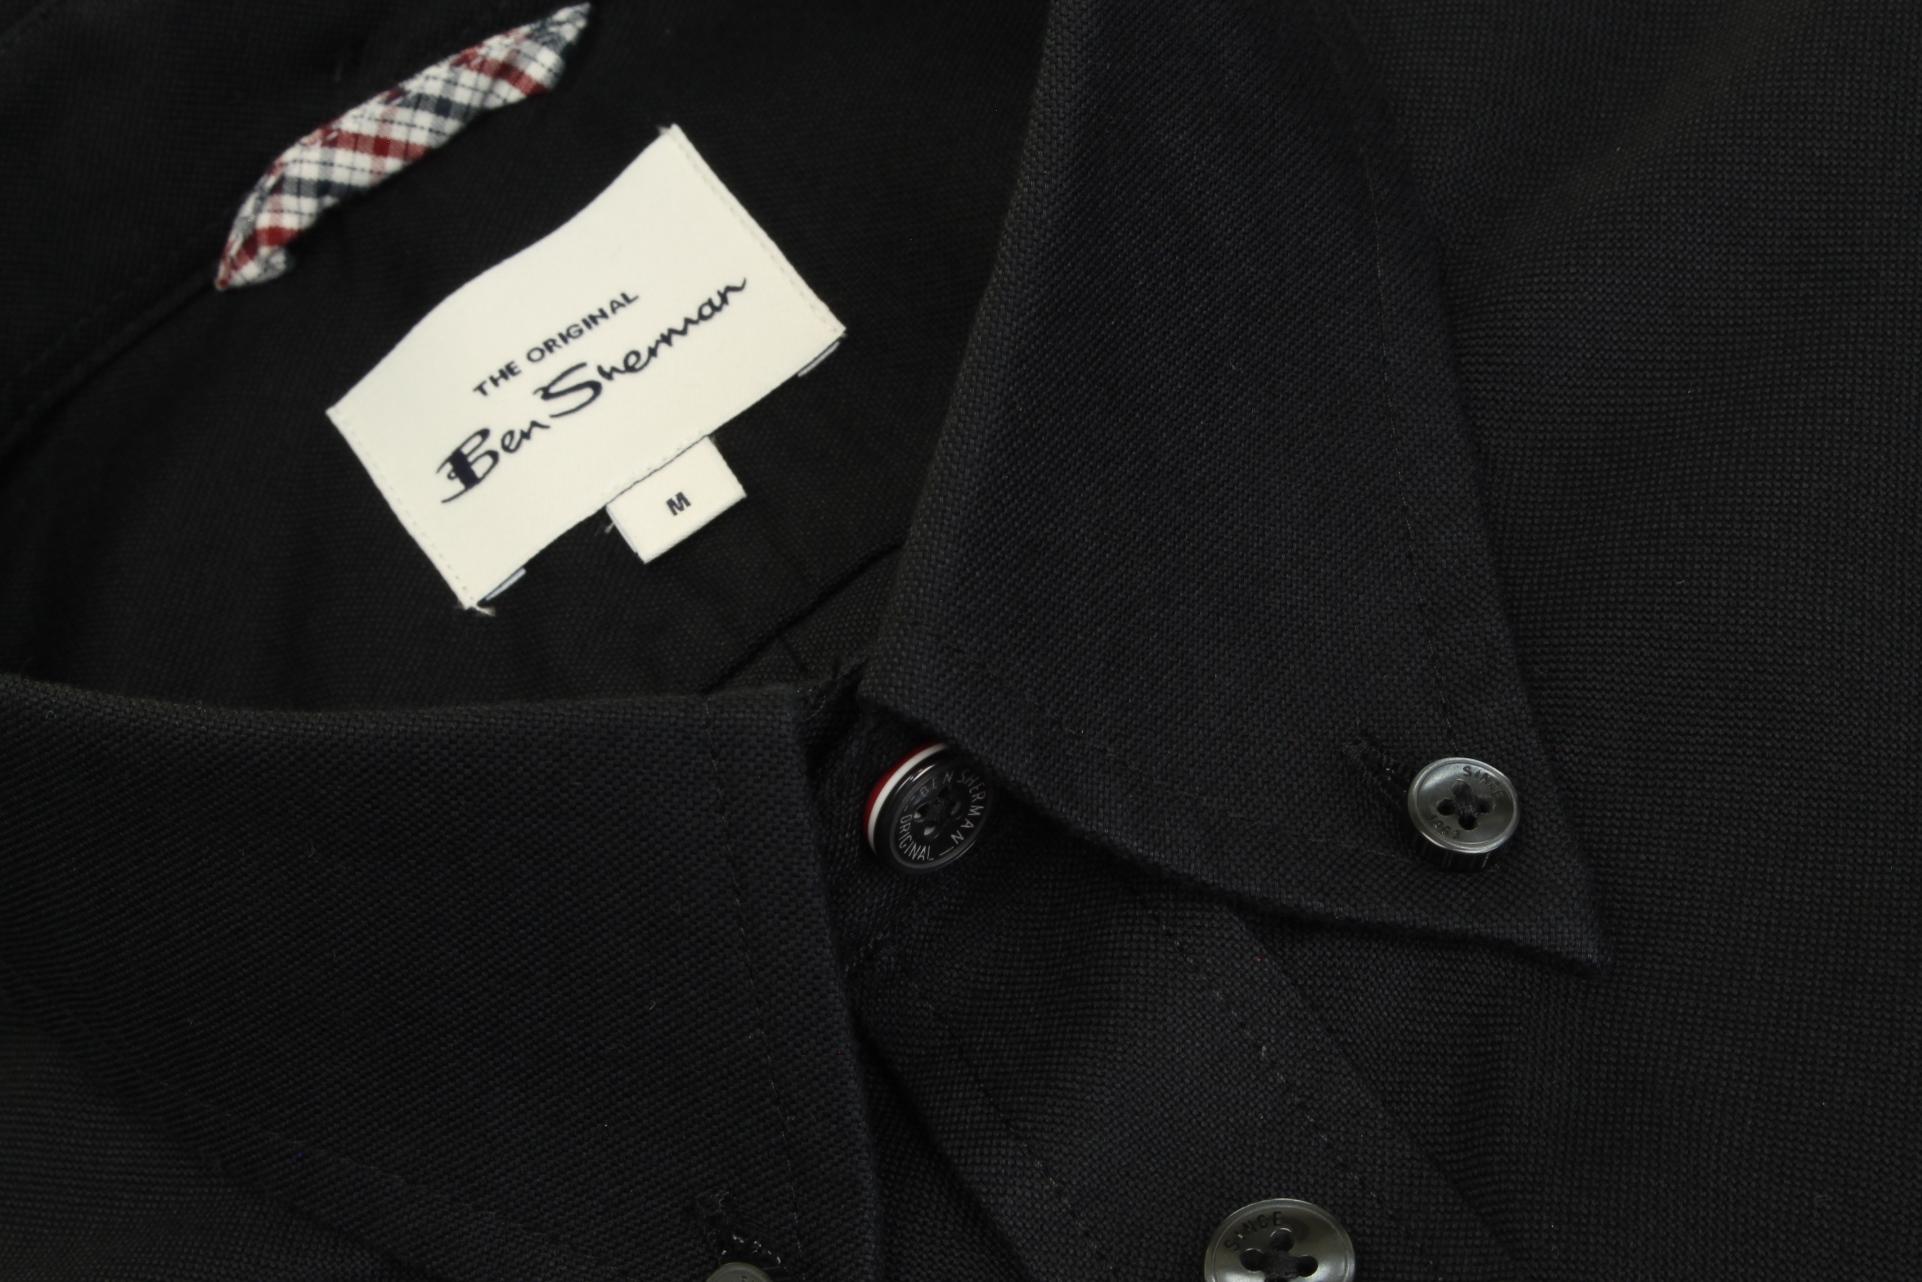 Mens-Oxford-Shirt-by-Ben-Sherman-Long-Sleeved thumbnail 9